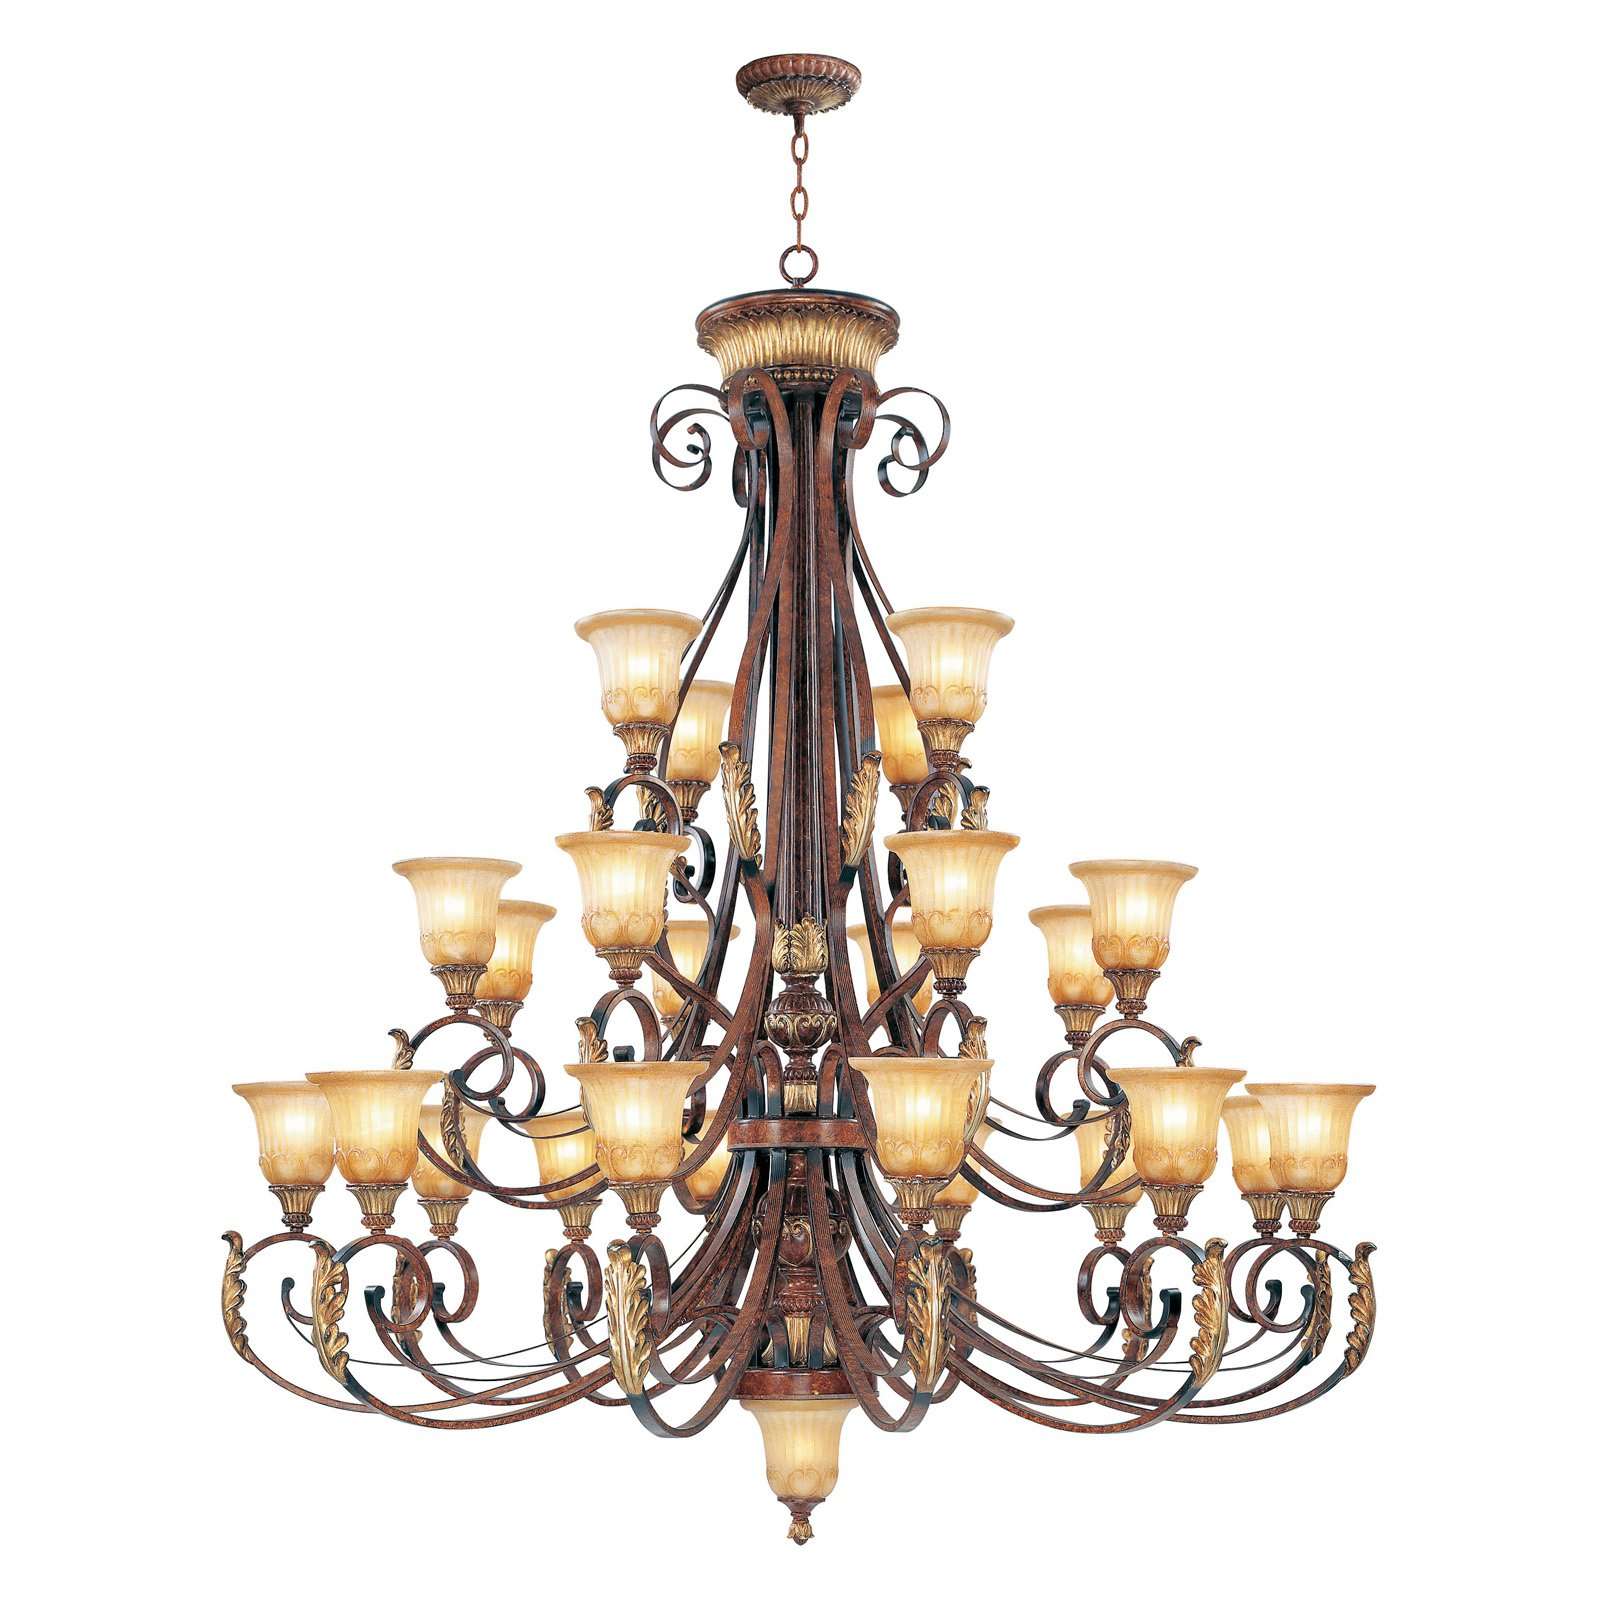 Livex Villa Verona 8589-63 Chandelier - Verona Bronze with Aged Gold Leaf Accents - 60-watt in.